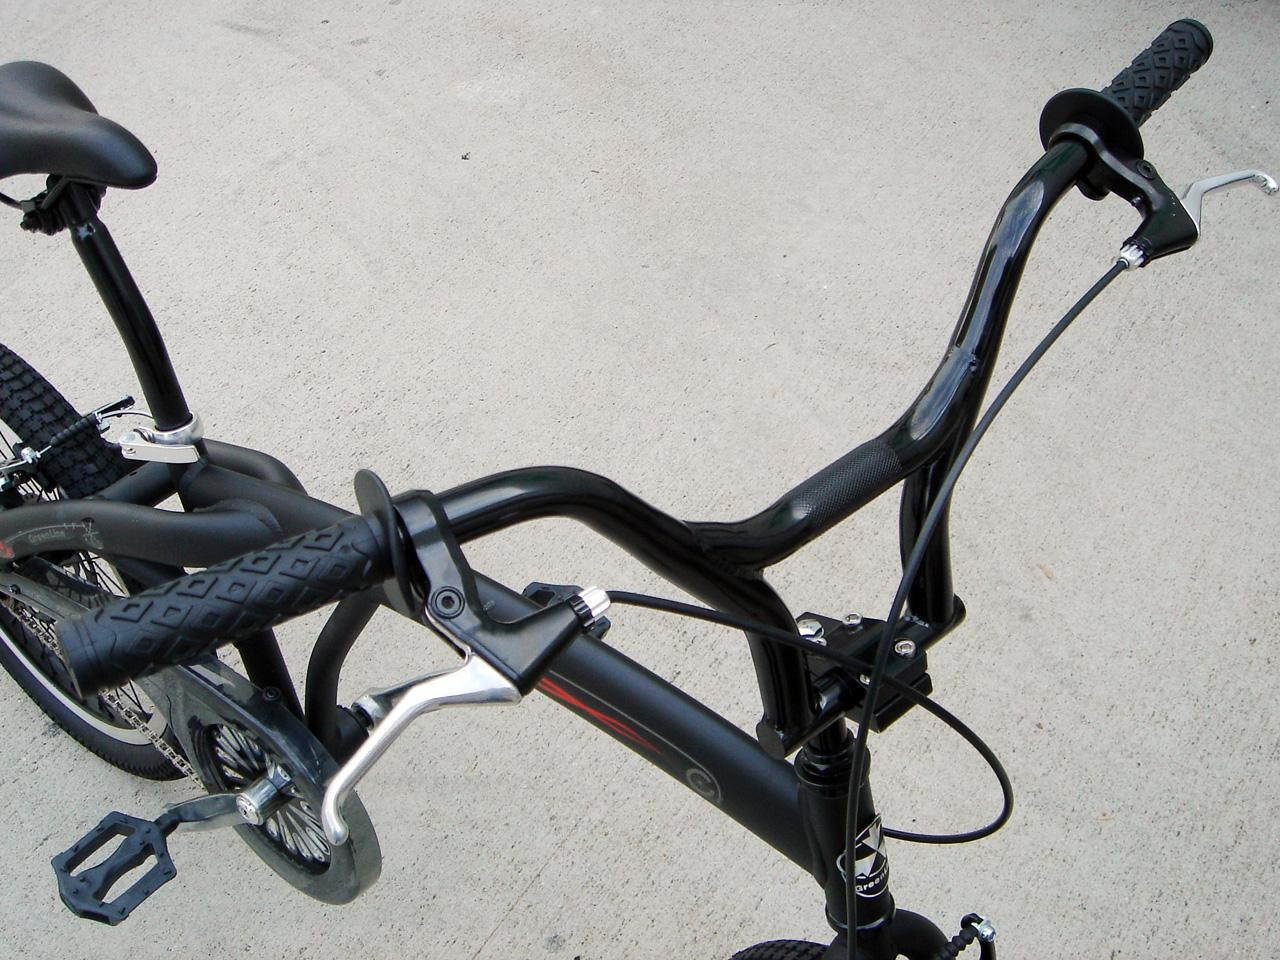 Bmx Freestyle 20 Inch Aluminum Bike Silver